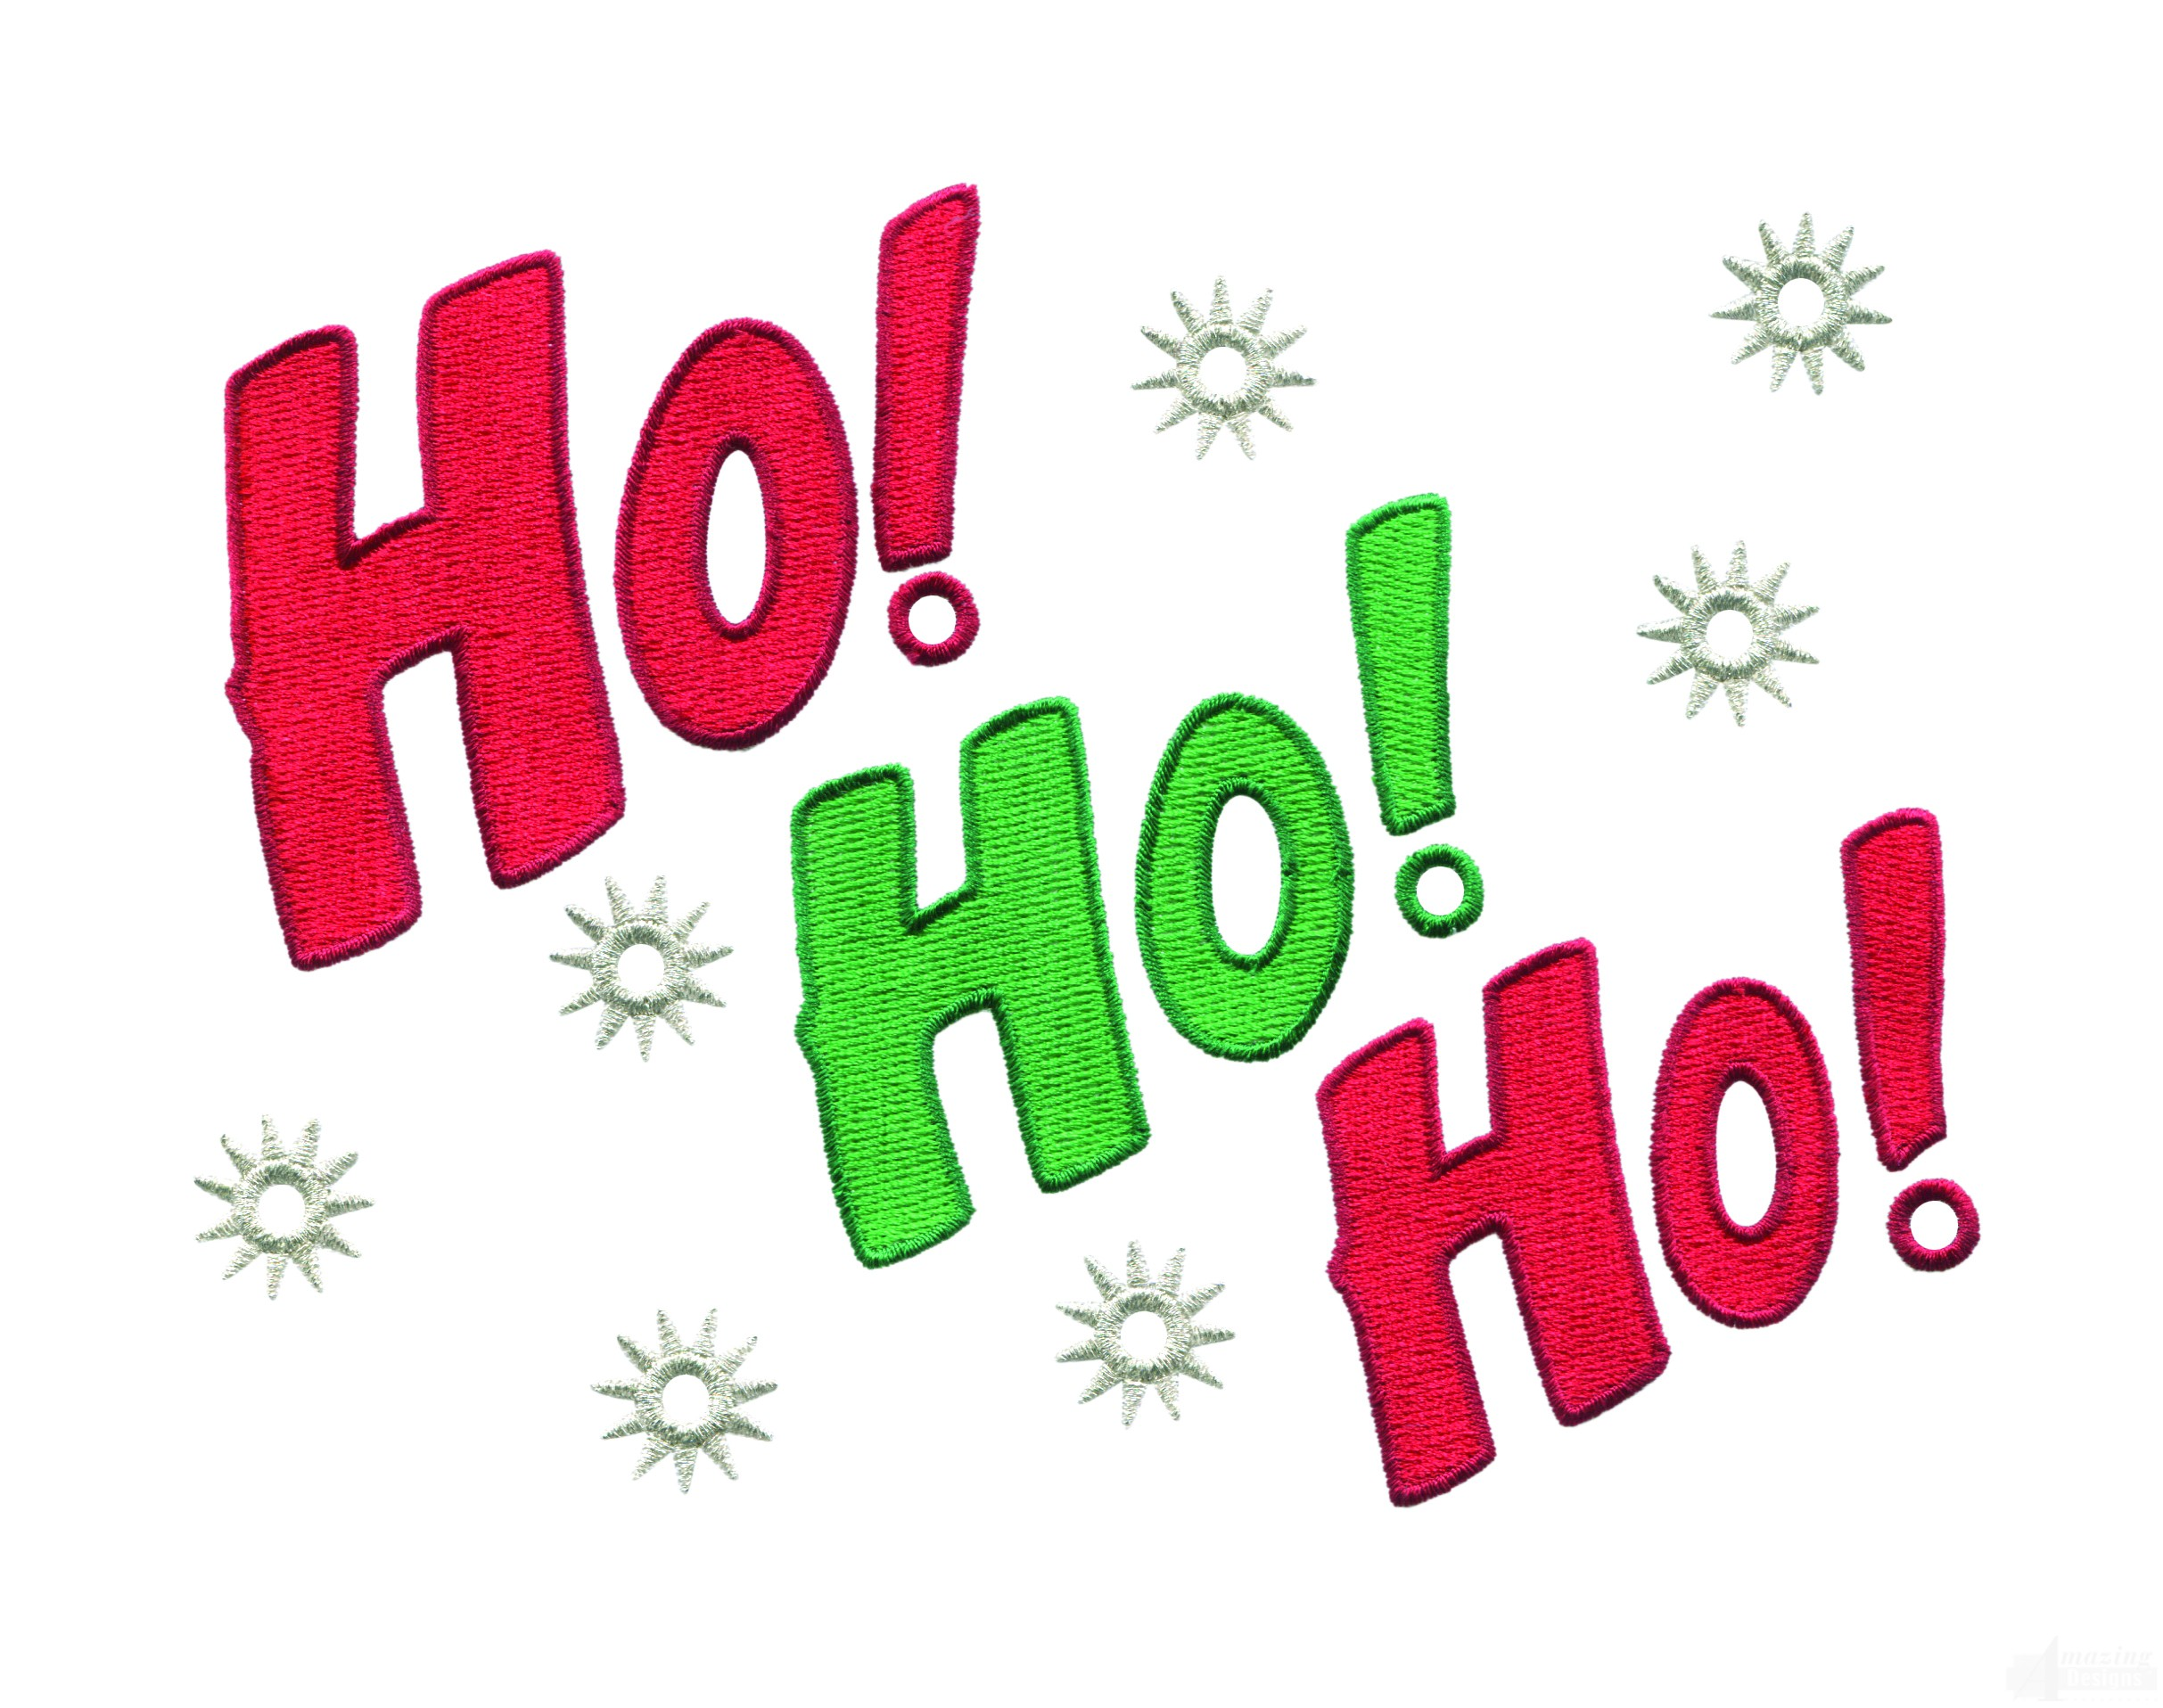 Transparent ho ho ho clipart download SGEM#58: Happy Ho, Ho, Ho to You | The Skeptics Guide to ... download